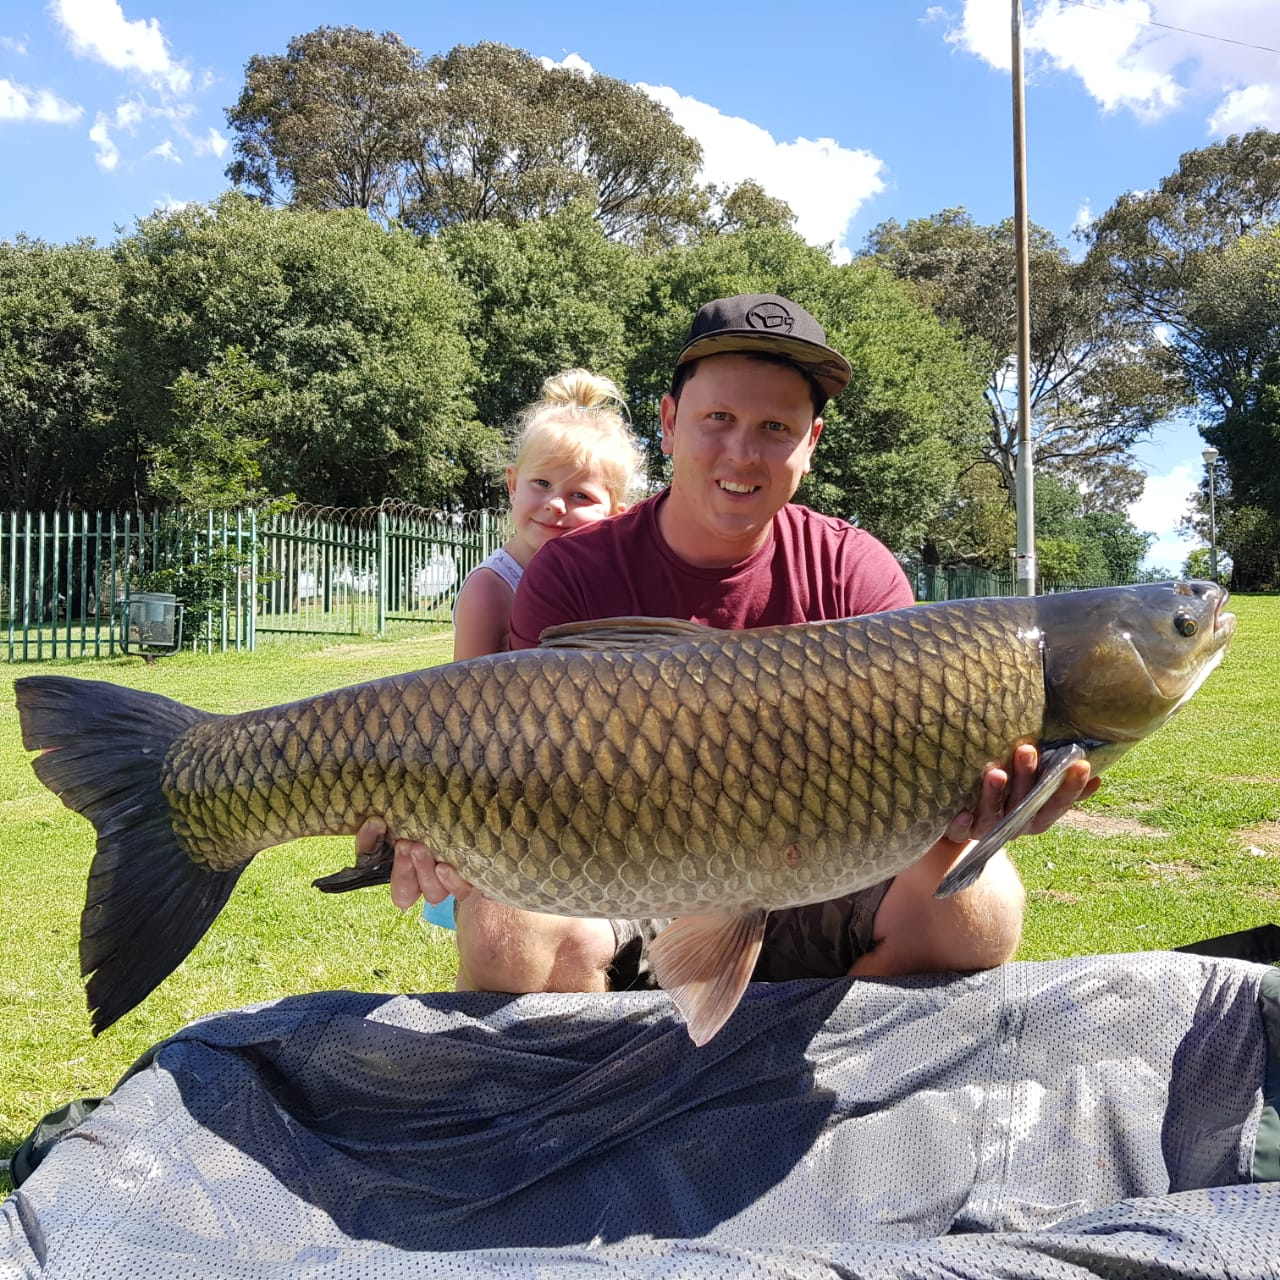 how to, wefish, south africa, johannesburg damn, water, river, hot spot, spots, sport, Man holding a rare Grass Carp trophy pose.